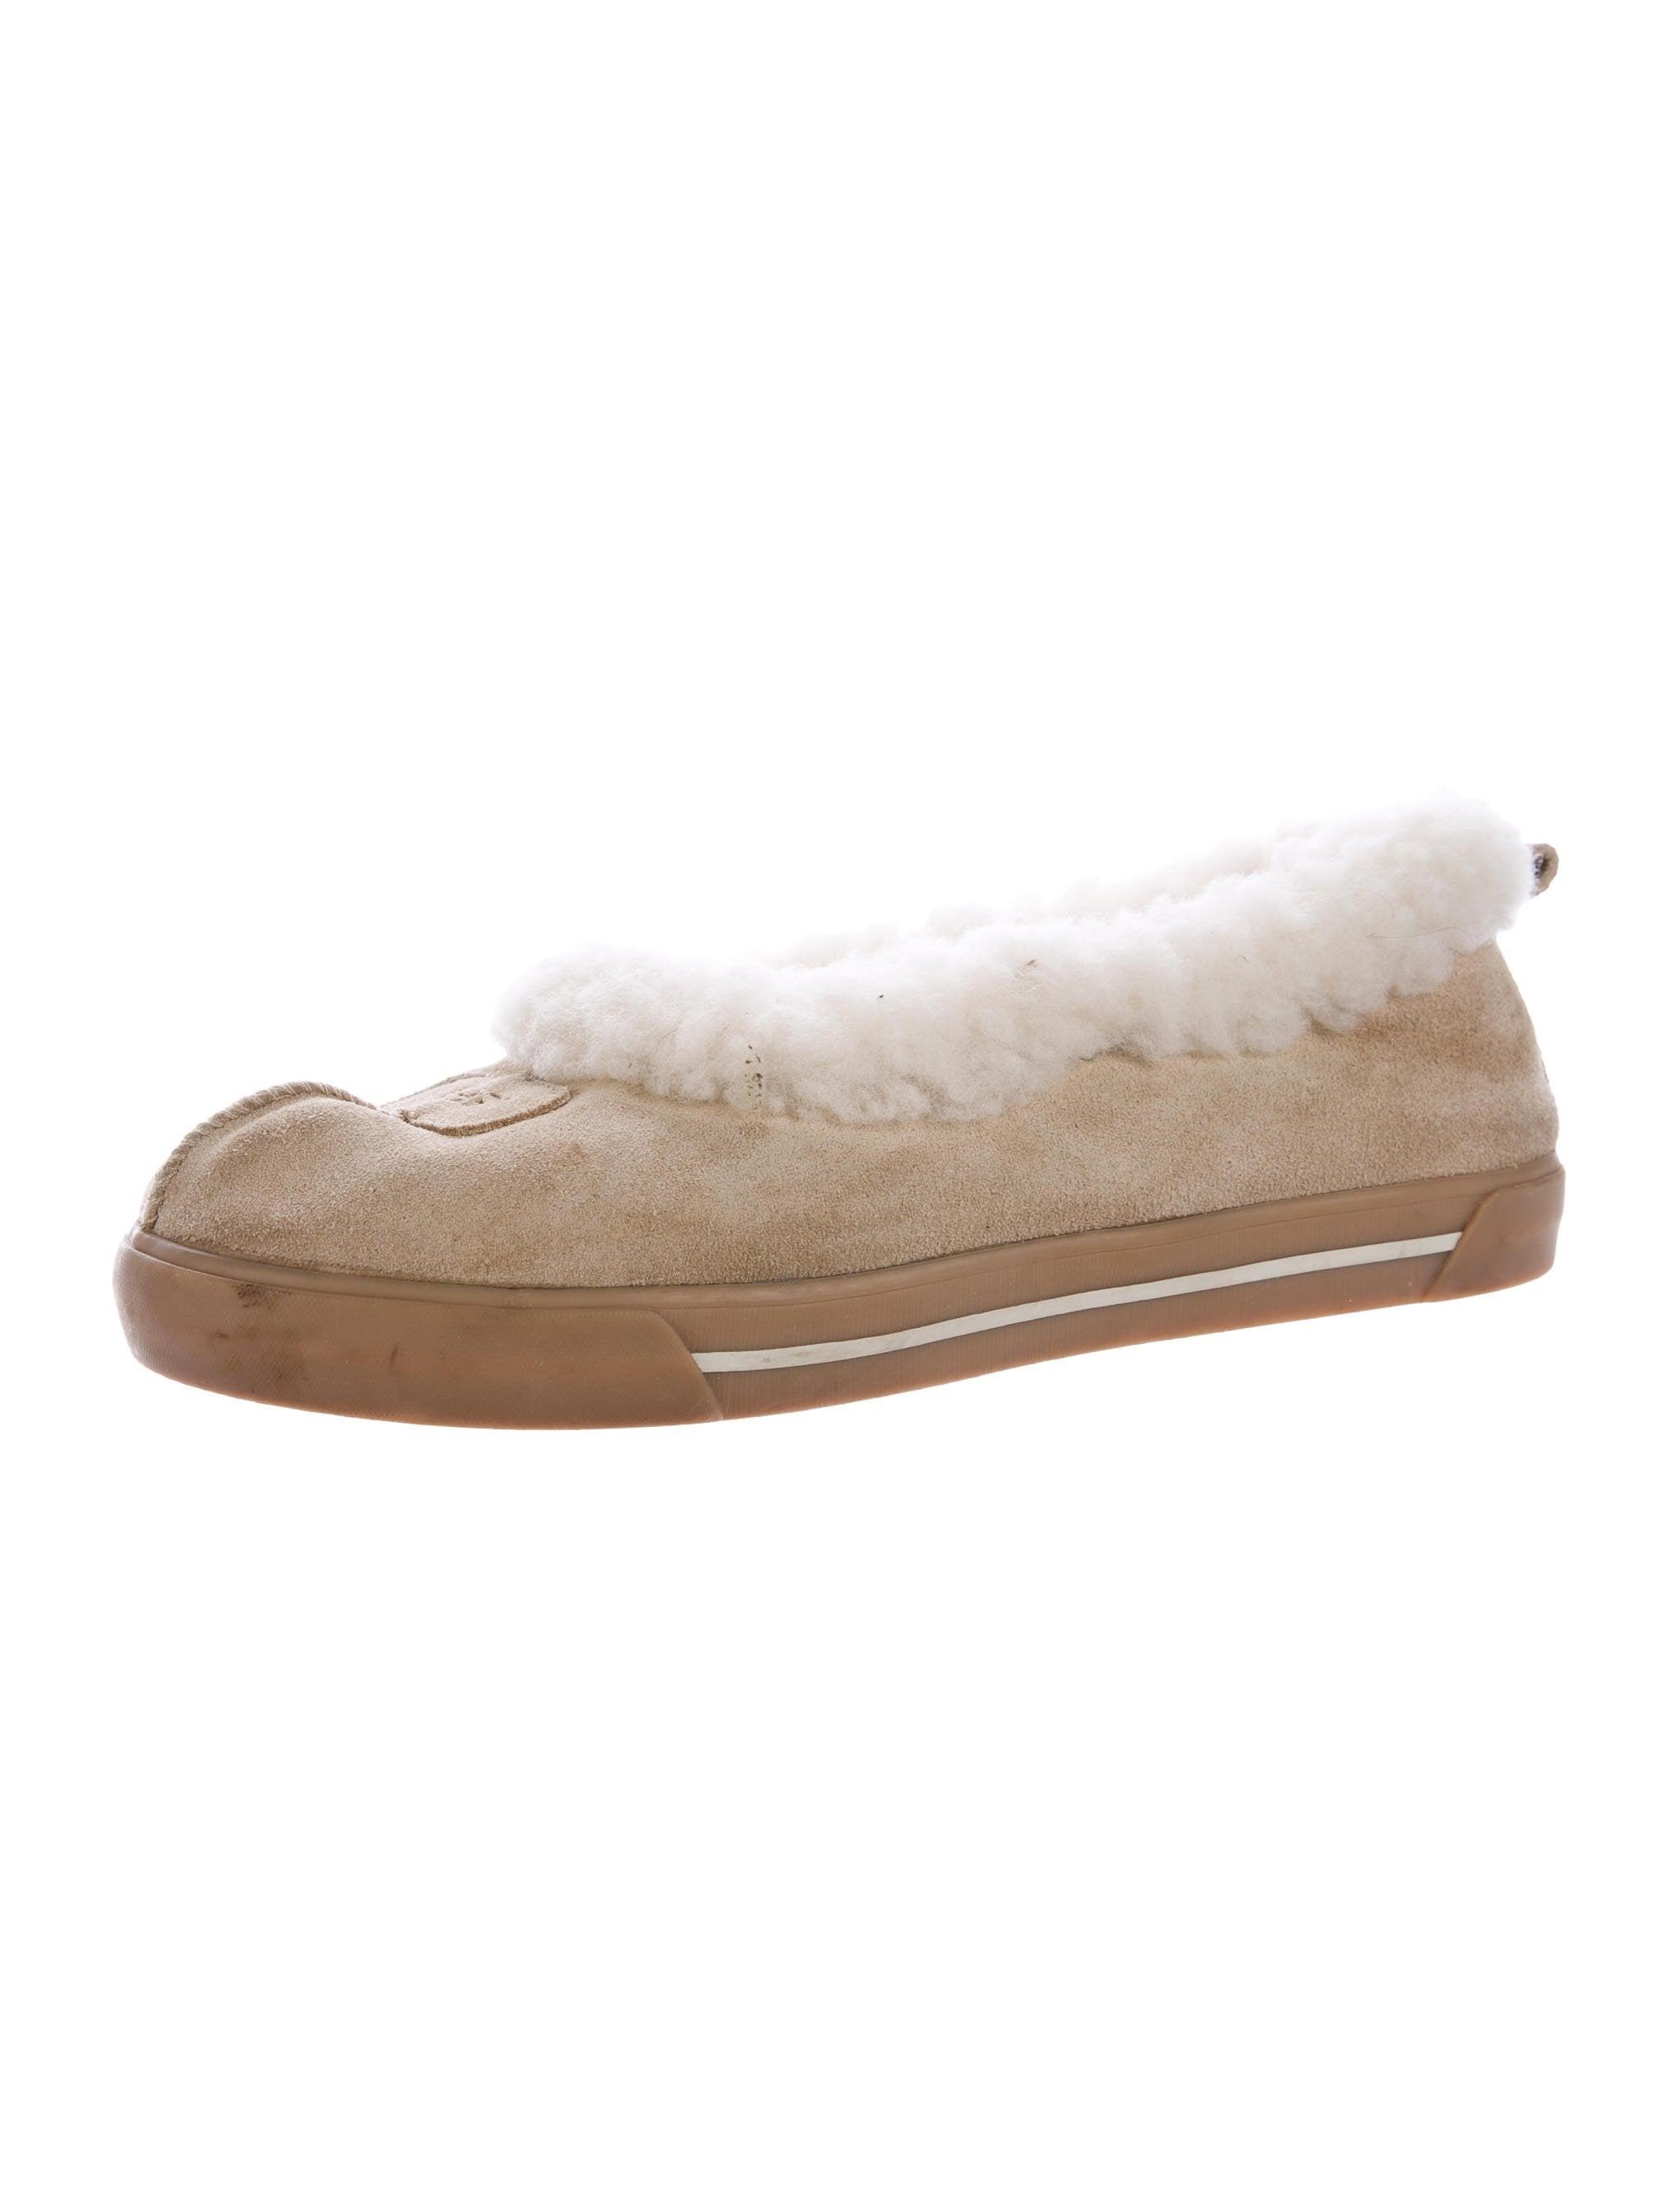 Knitting Slippers For Dummies : Ugg rylan slippers size